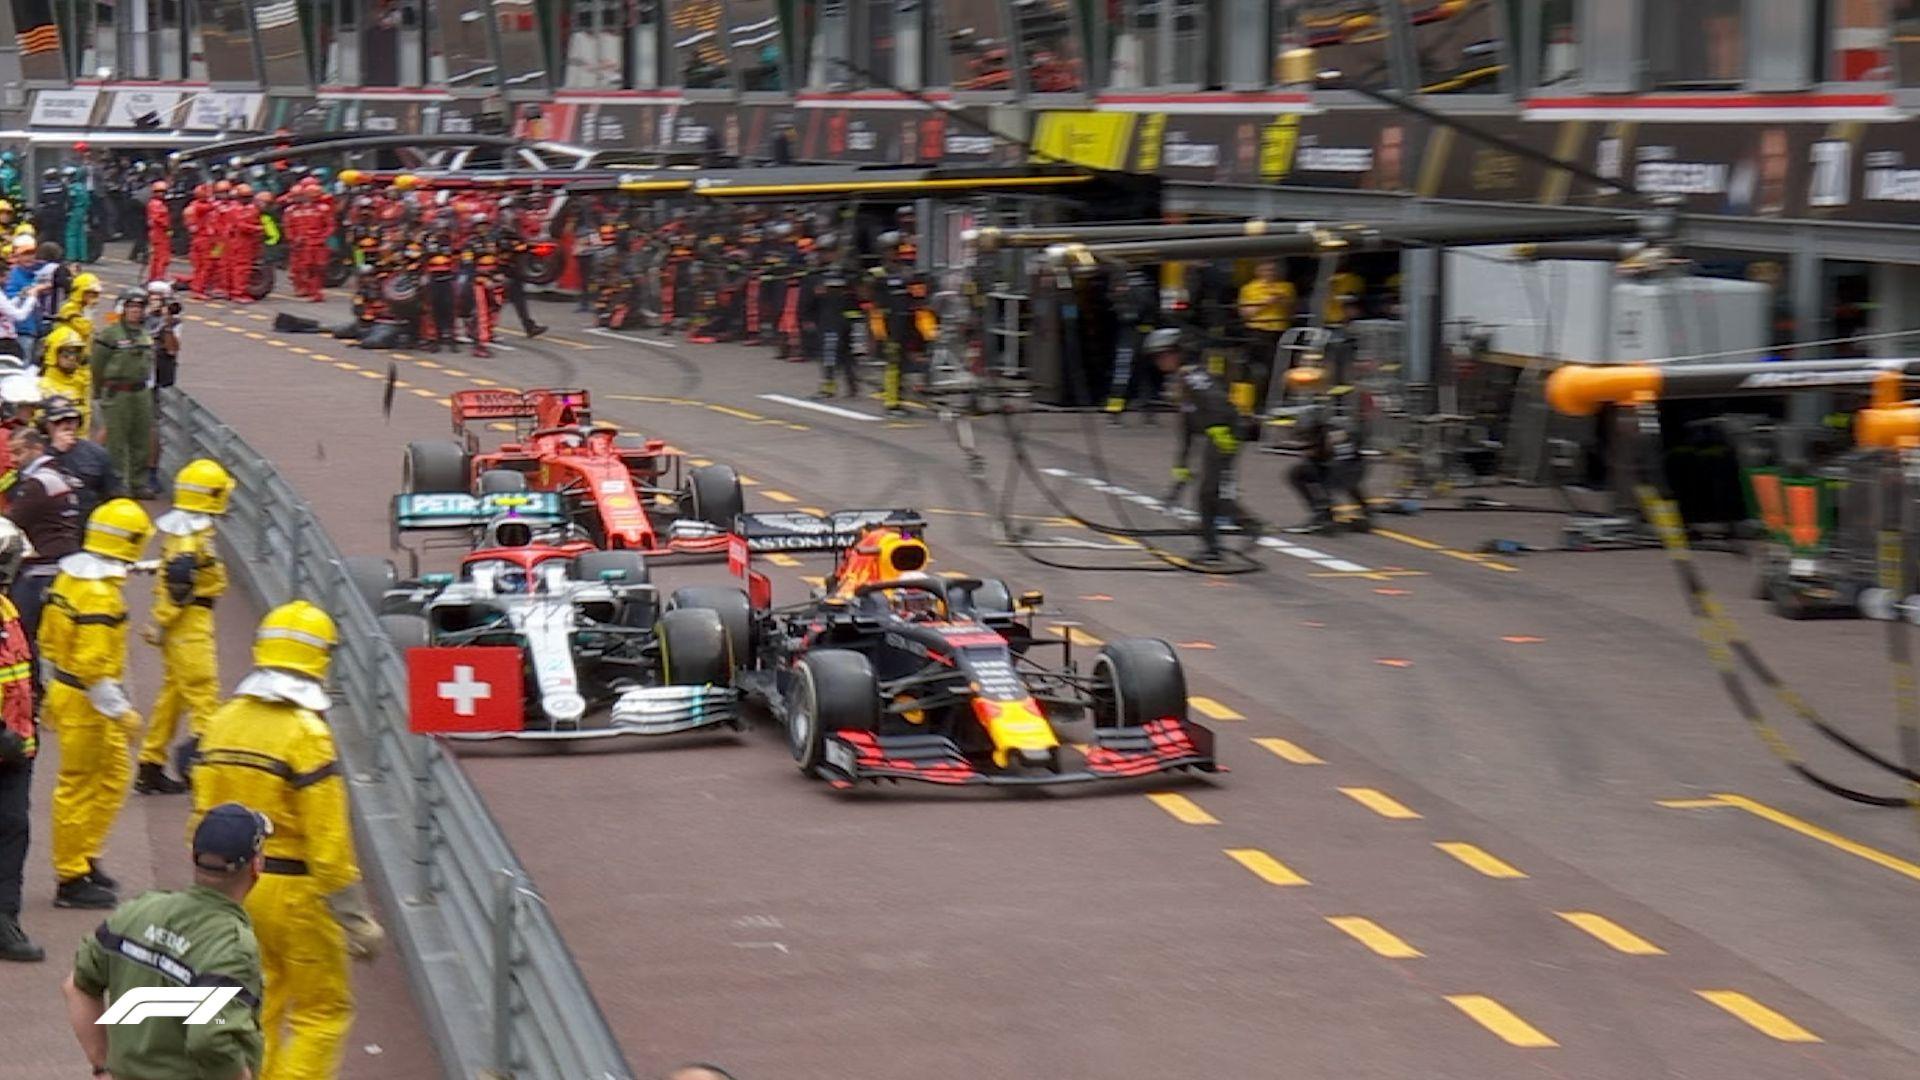 MONACO GP: Verstappen jumps Bottas after contact in the pit lane